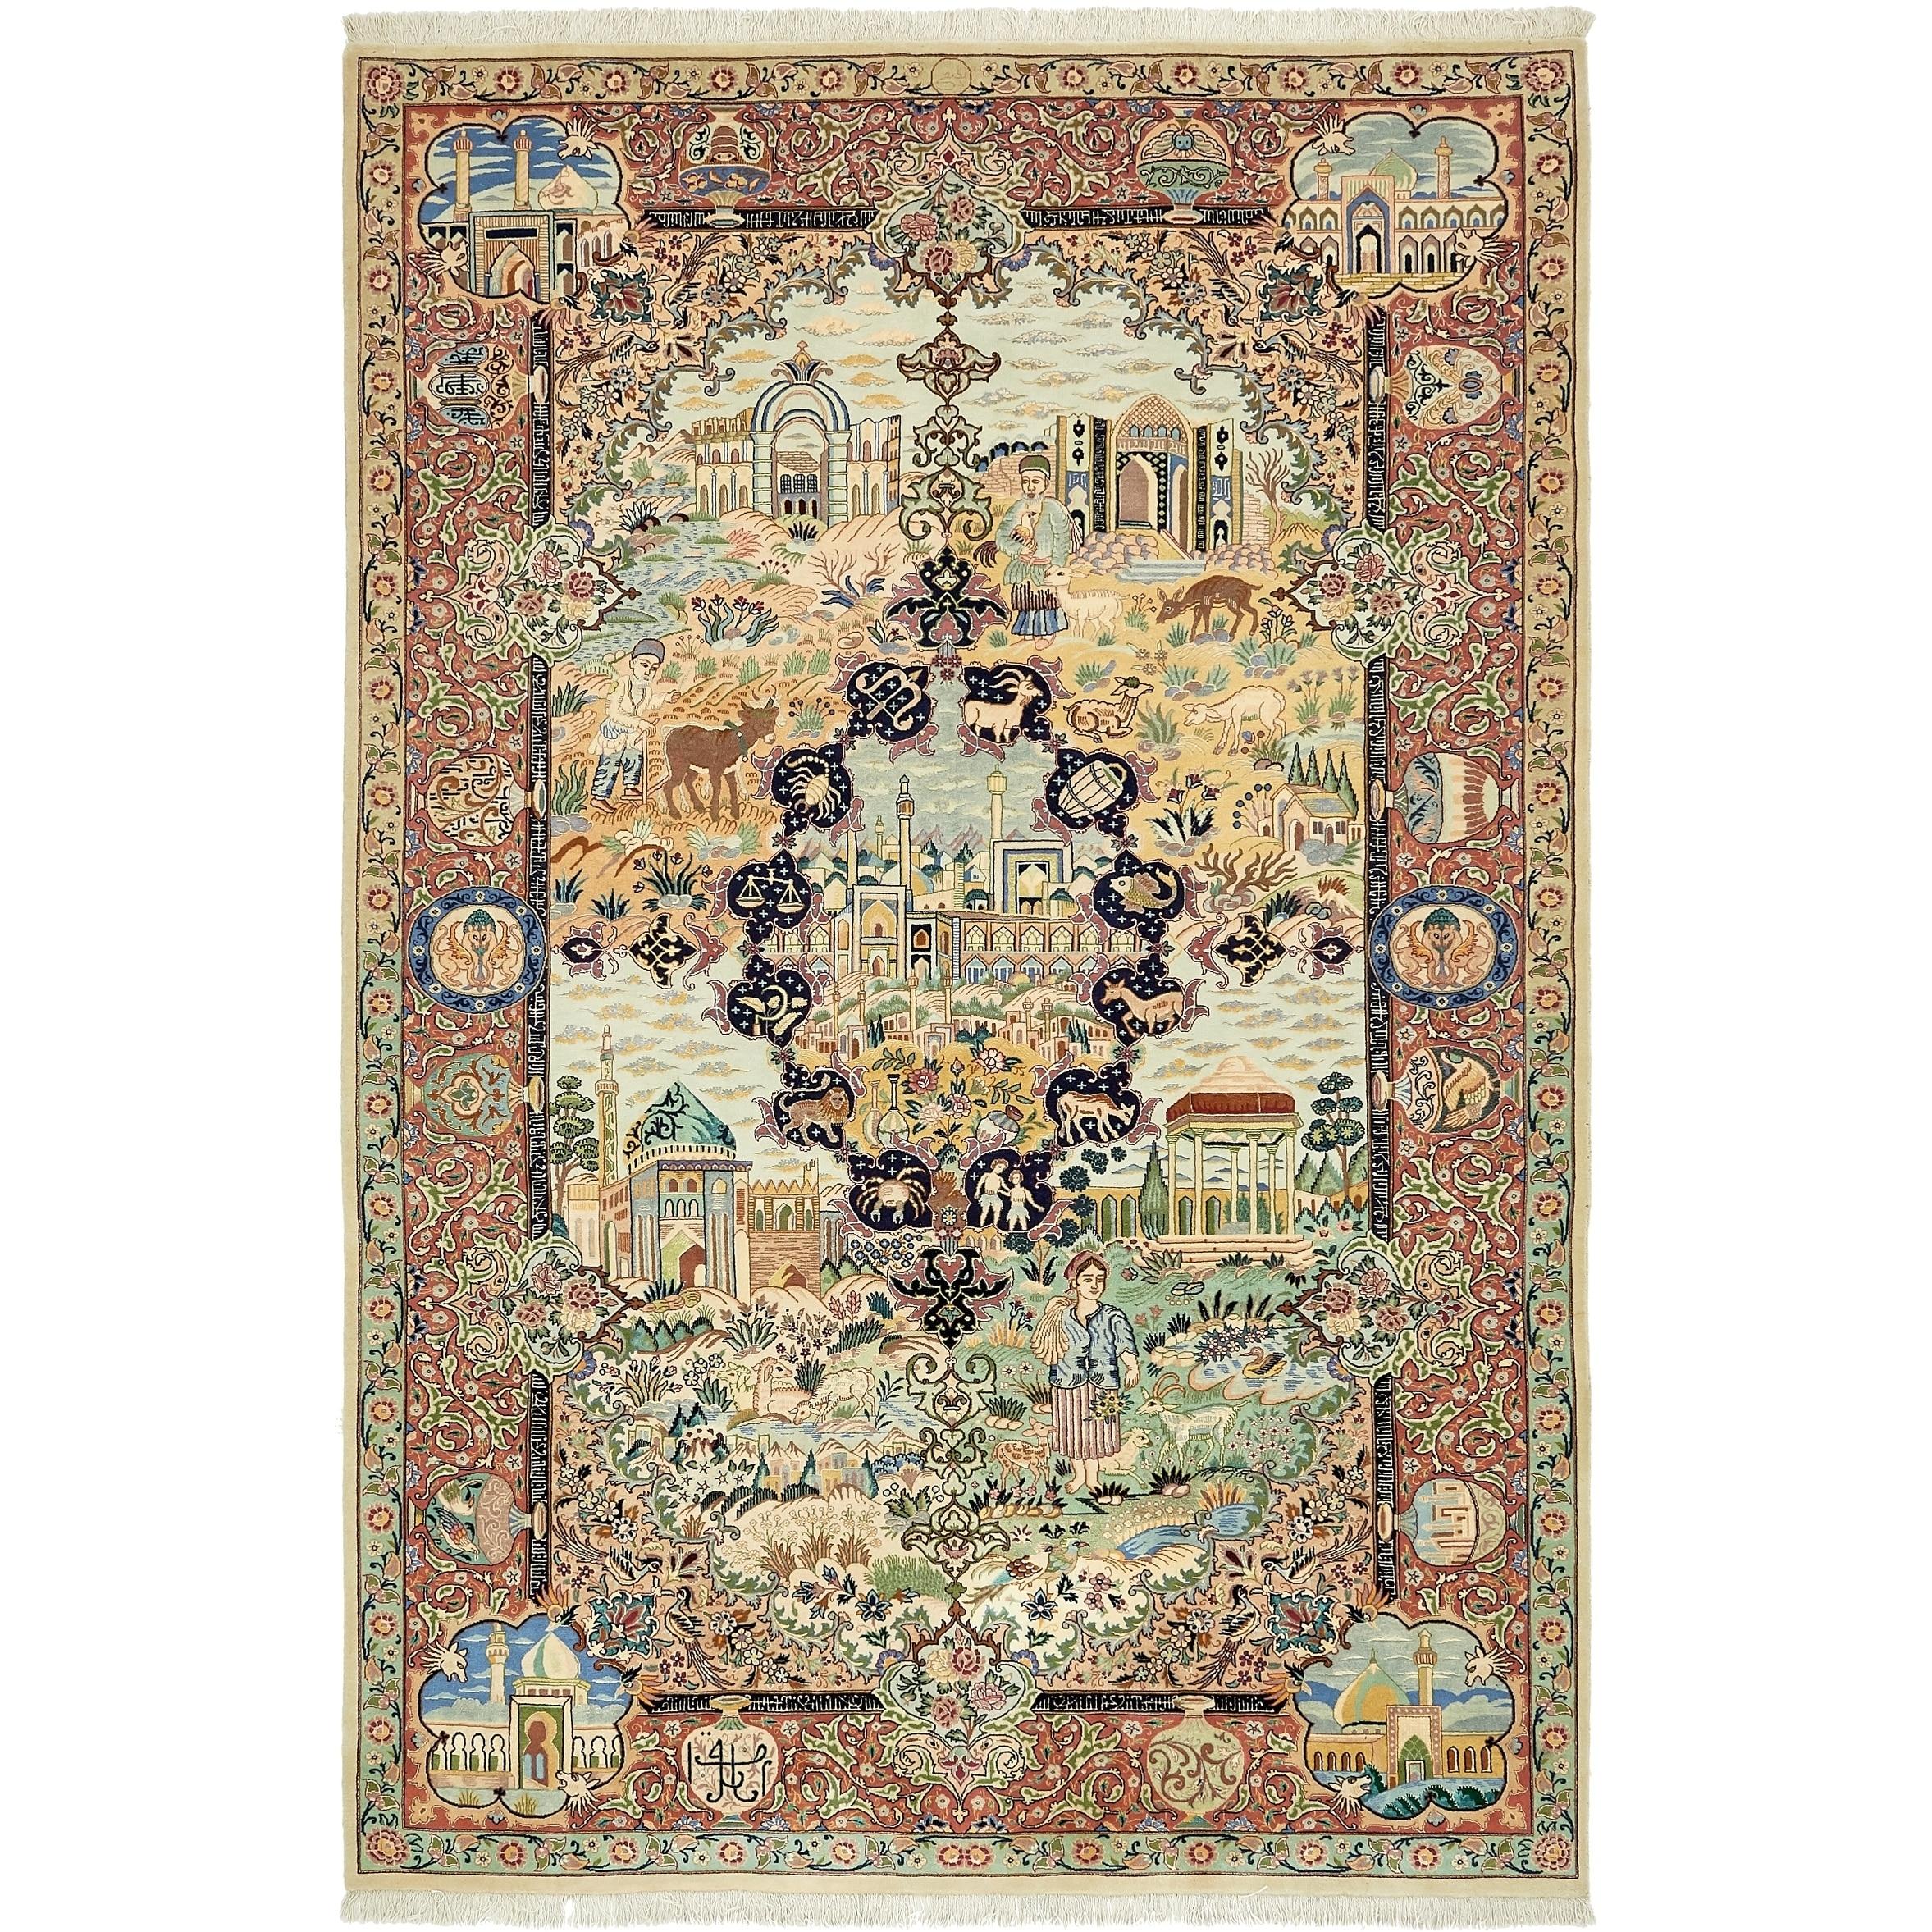 Hand Knotted Kashmar Silk & Wool Area Rug - 6 6 x 9 9 (Light Blue - 6 6 x 9 9)